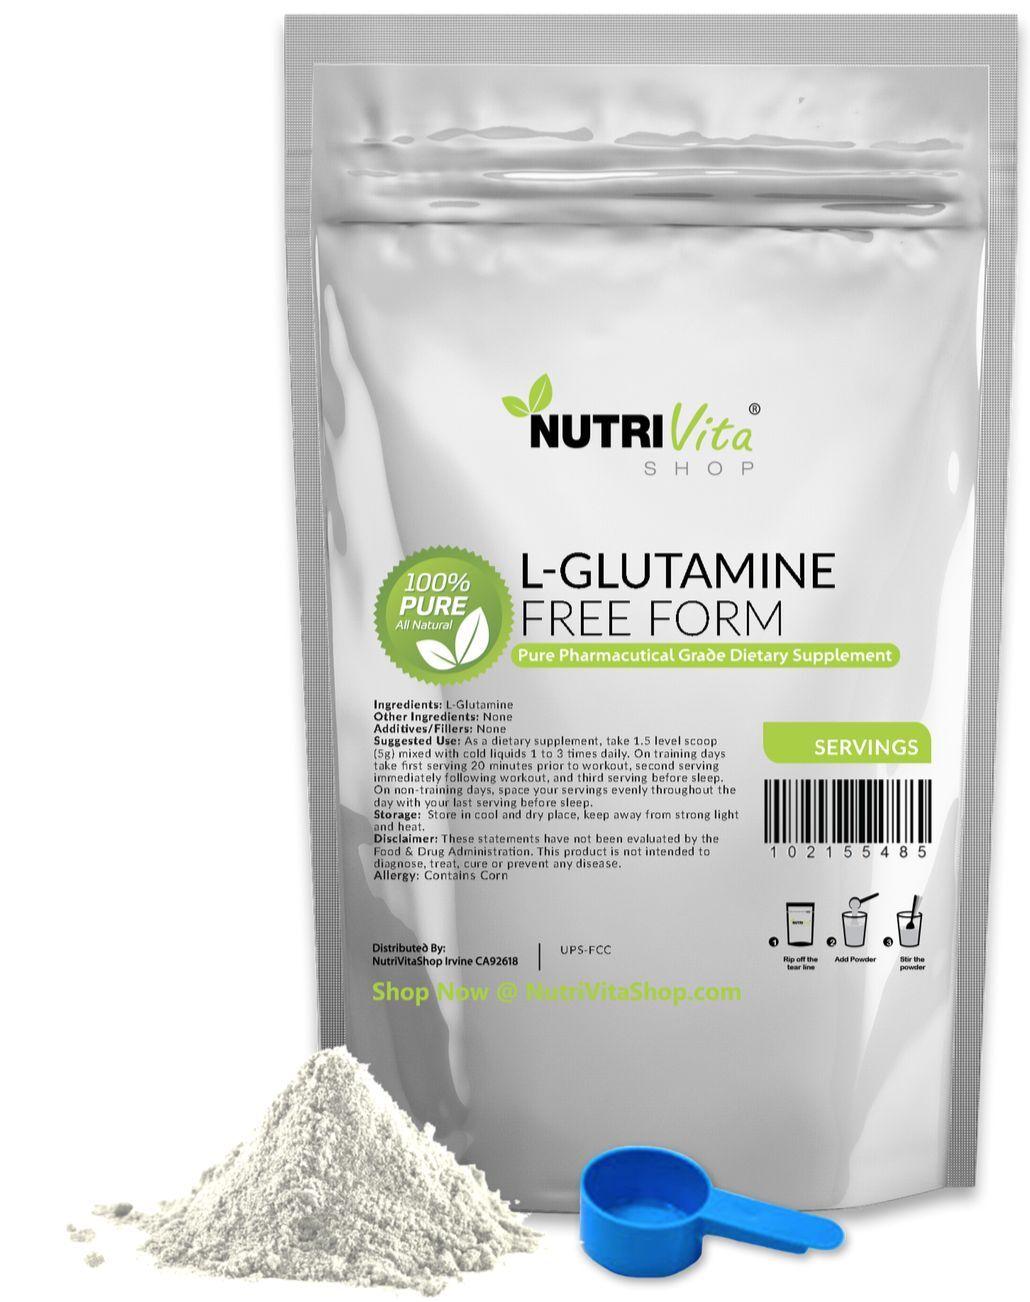 5.5lb (2500g) NEW FORM 100% L-GLUTAMINE FREE FORM NEW PHARMACEUTICAL GRADE 4f64b4